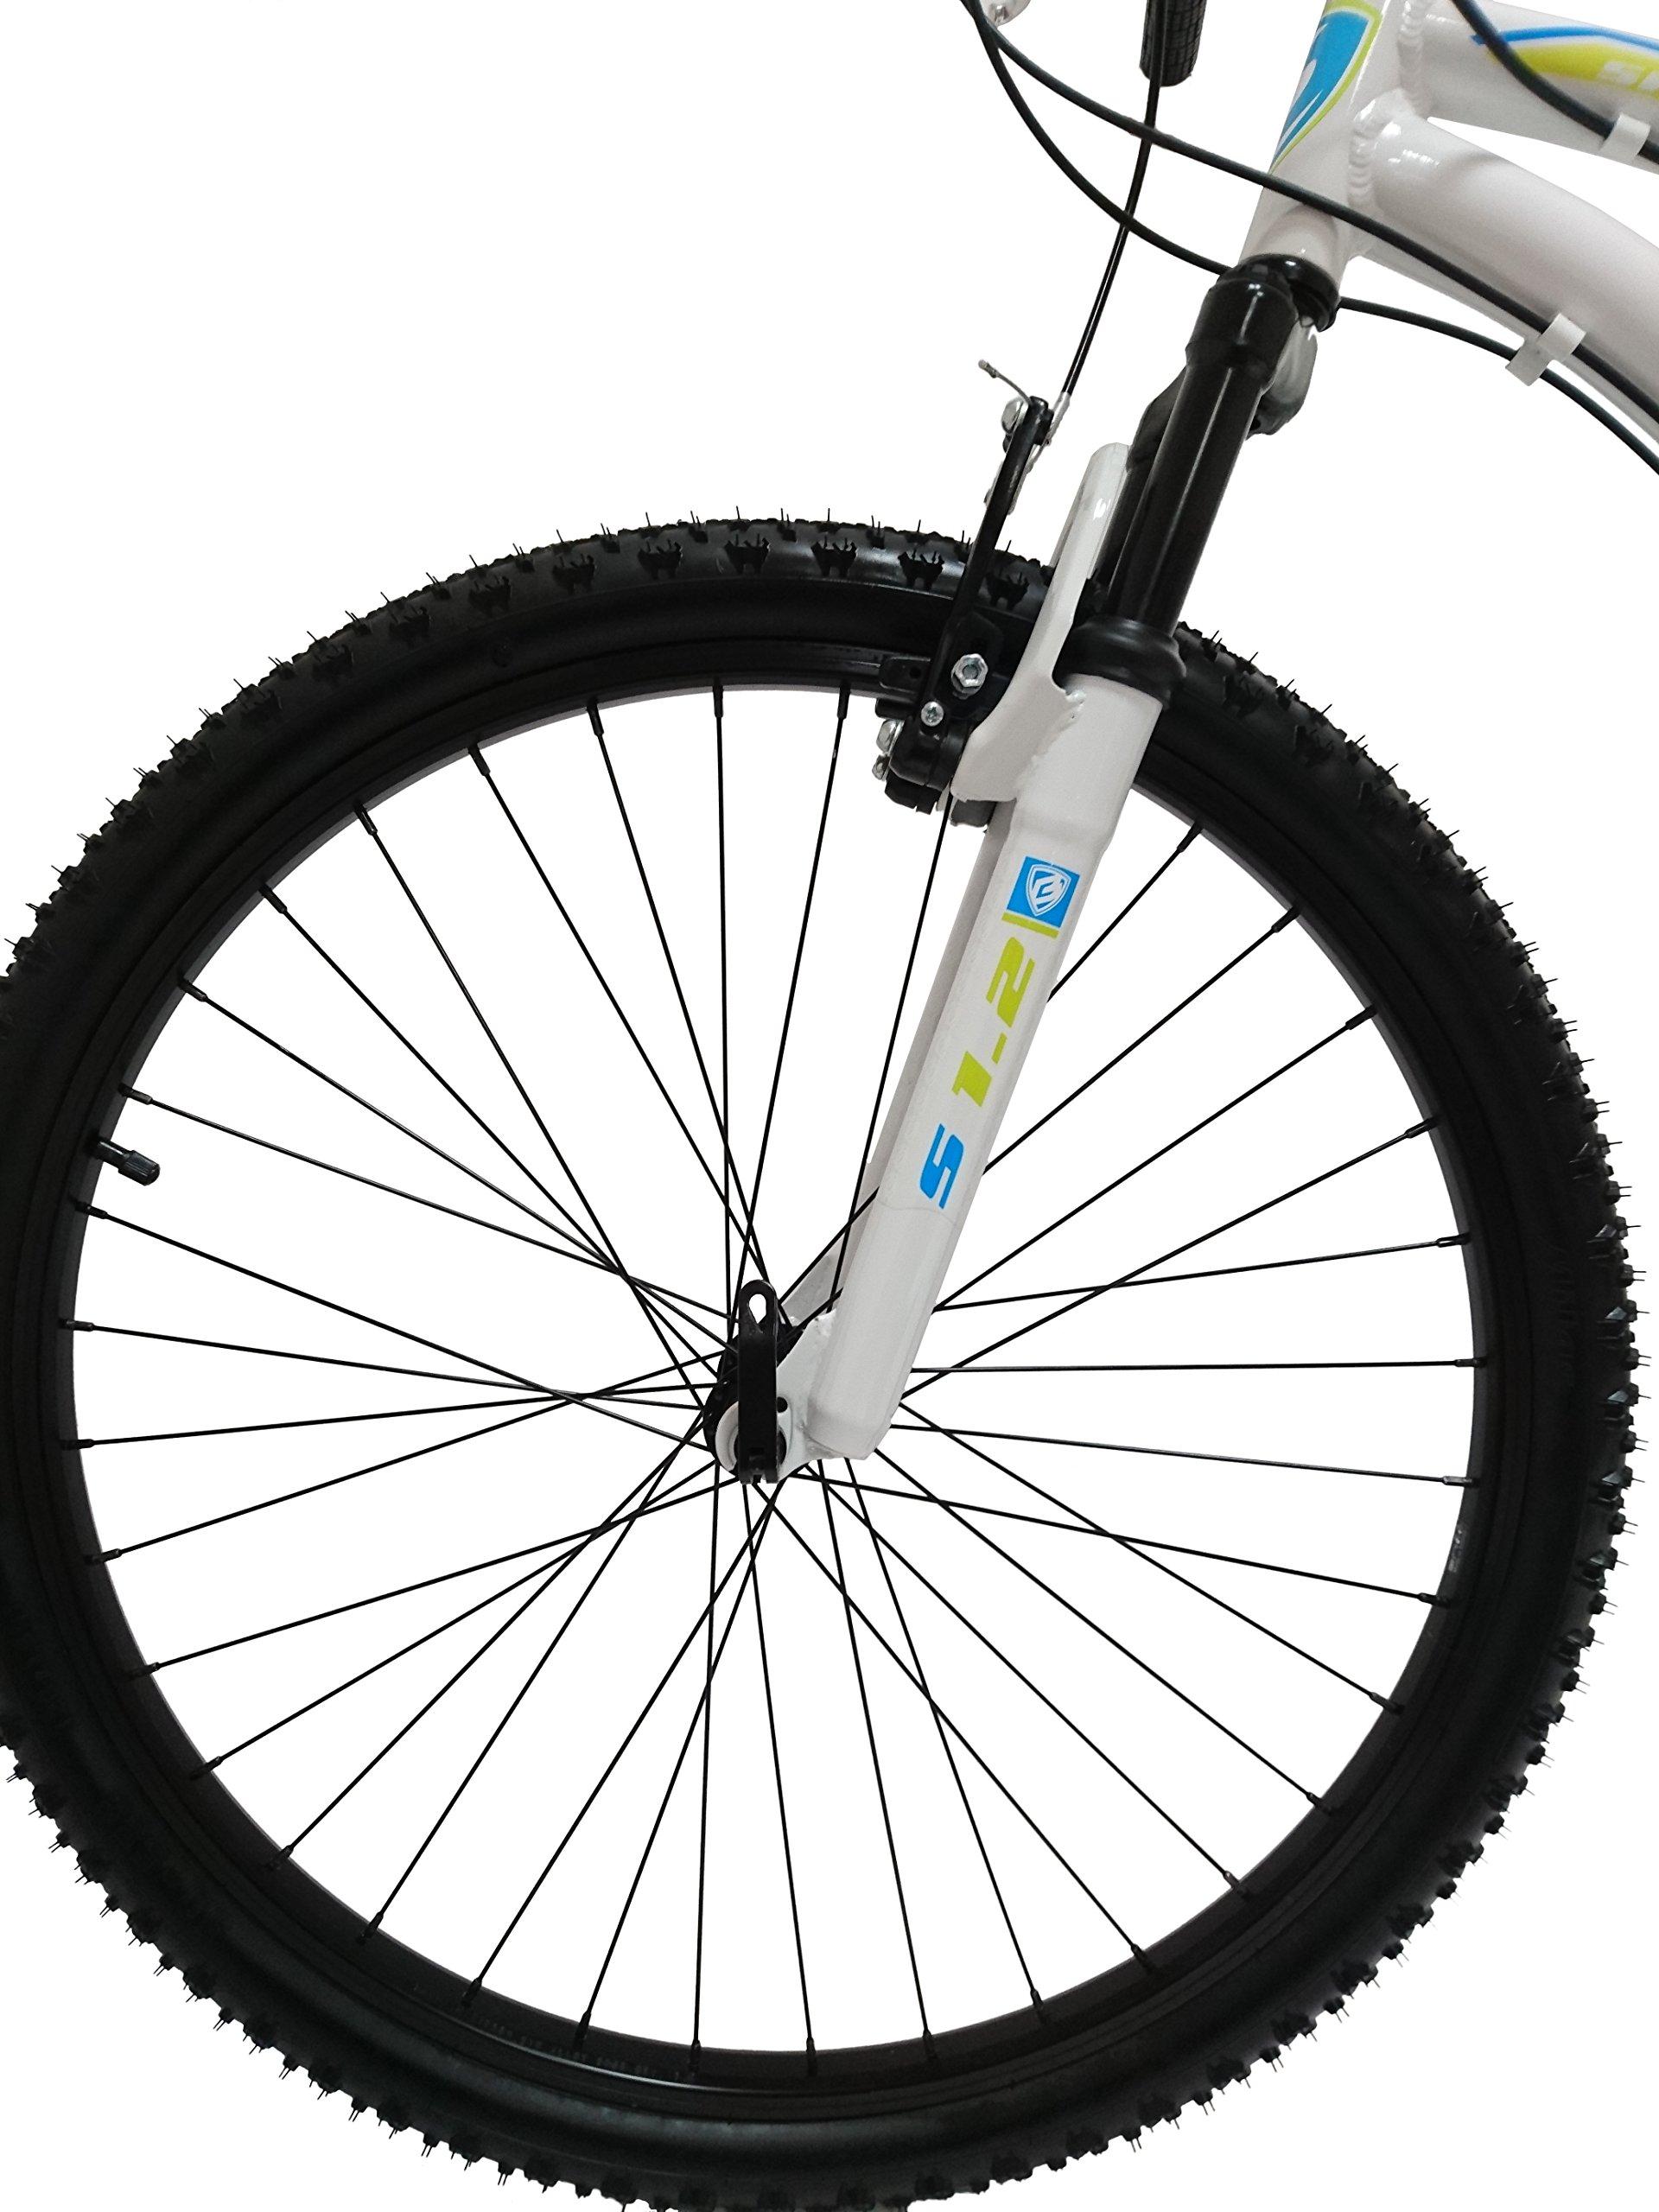 Discovery DP074 - Bicicleta Montaña Mountainbike 26